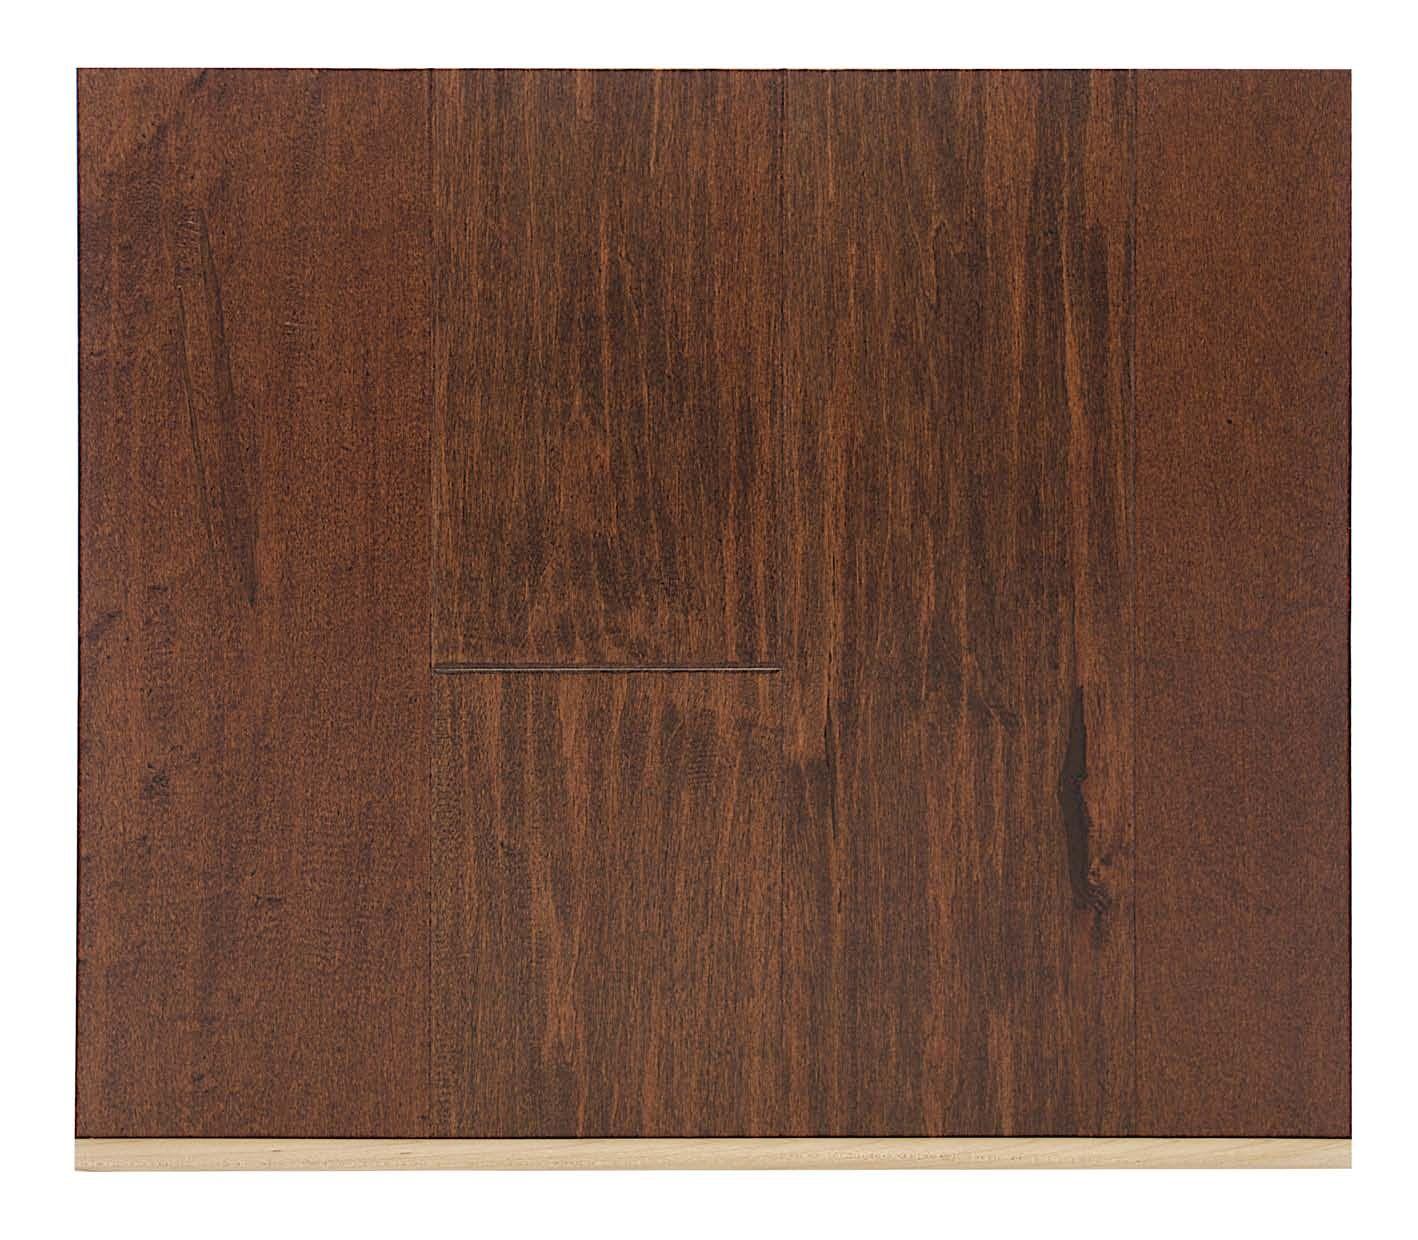 Hand Scraped Maple Oxford By Vintage Hardwood Flooring: Hand Scraped Maple Morocco By Vintage Hardwood Flooring